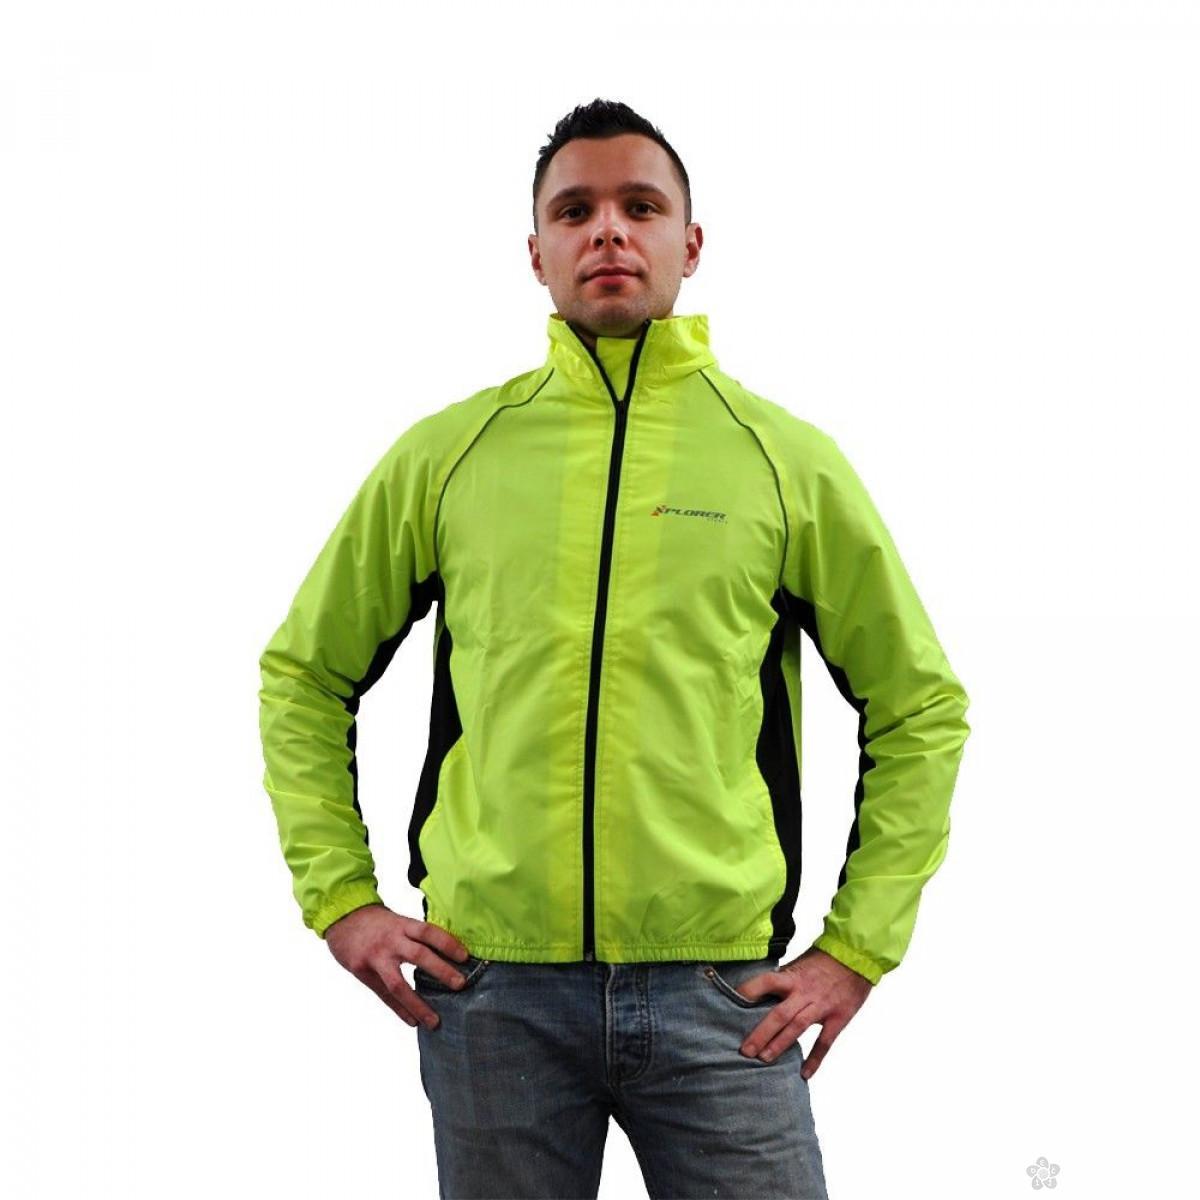 Biciklistička jakna Xplorer Scirocco vel. XL